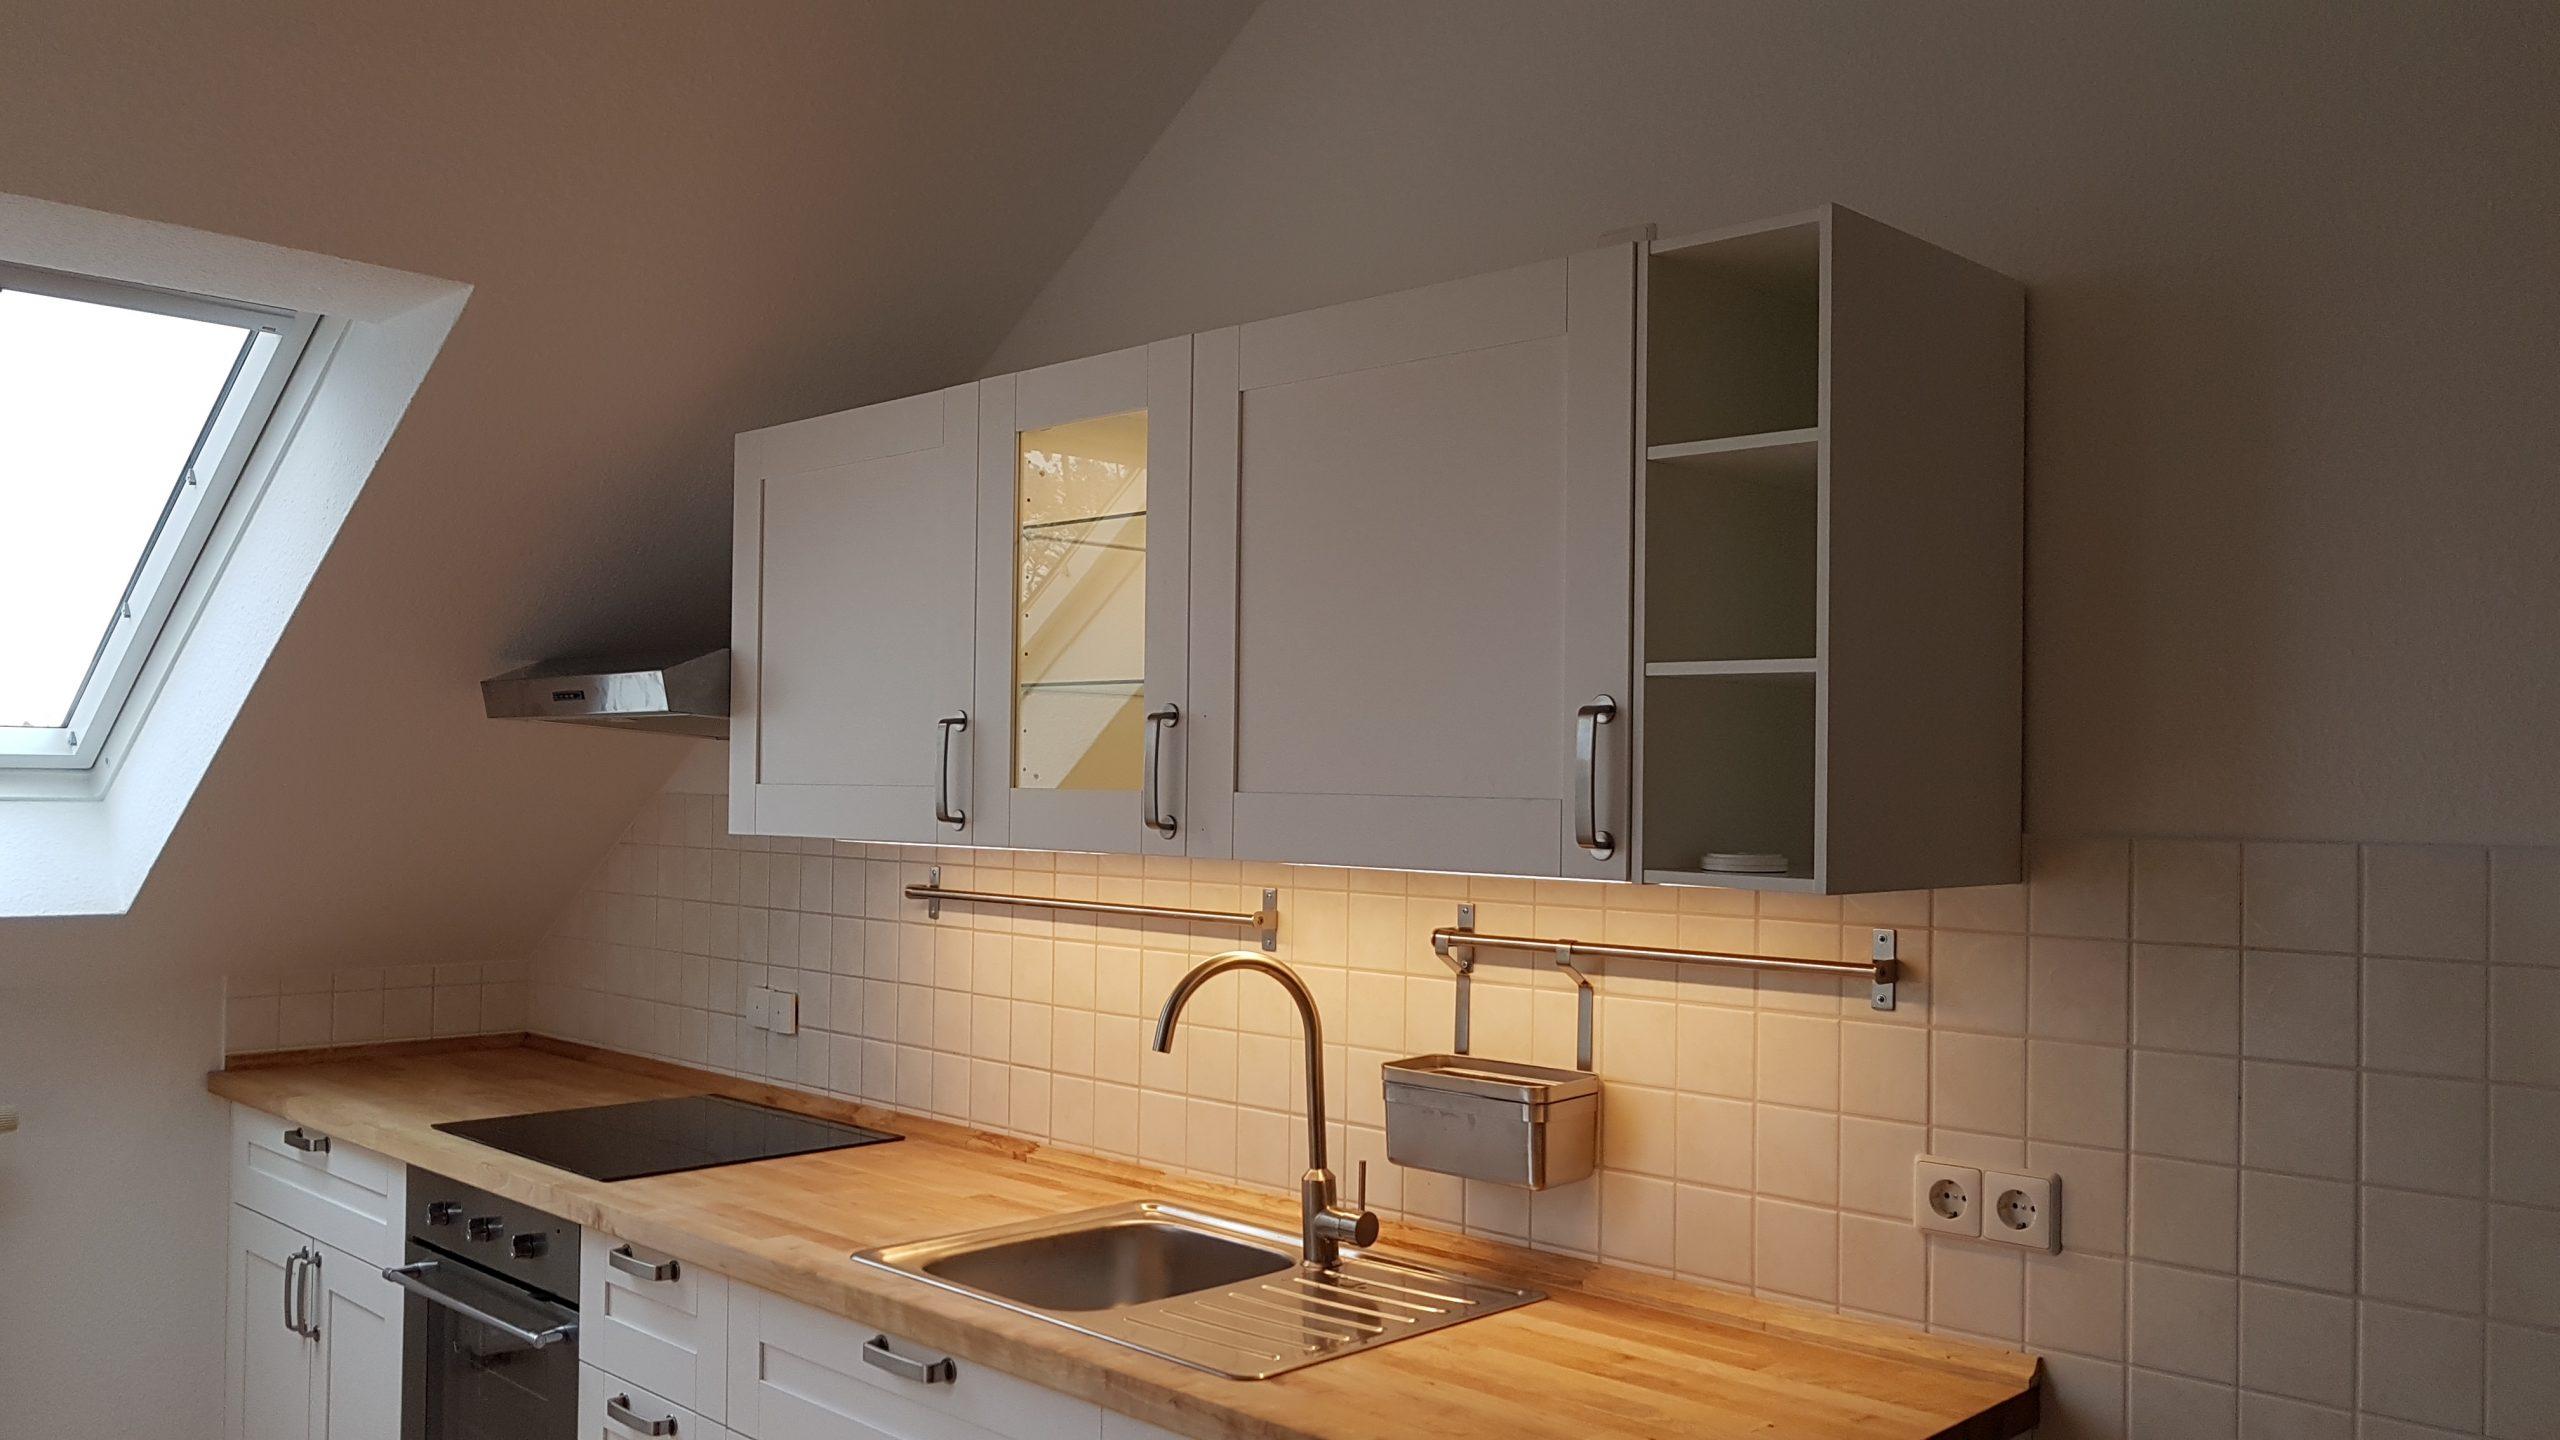 Küche Kosten Pro Meter | Küche Kosten Pro Meter | 20 Achat ...